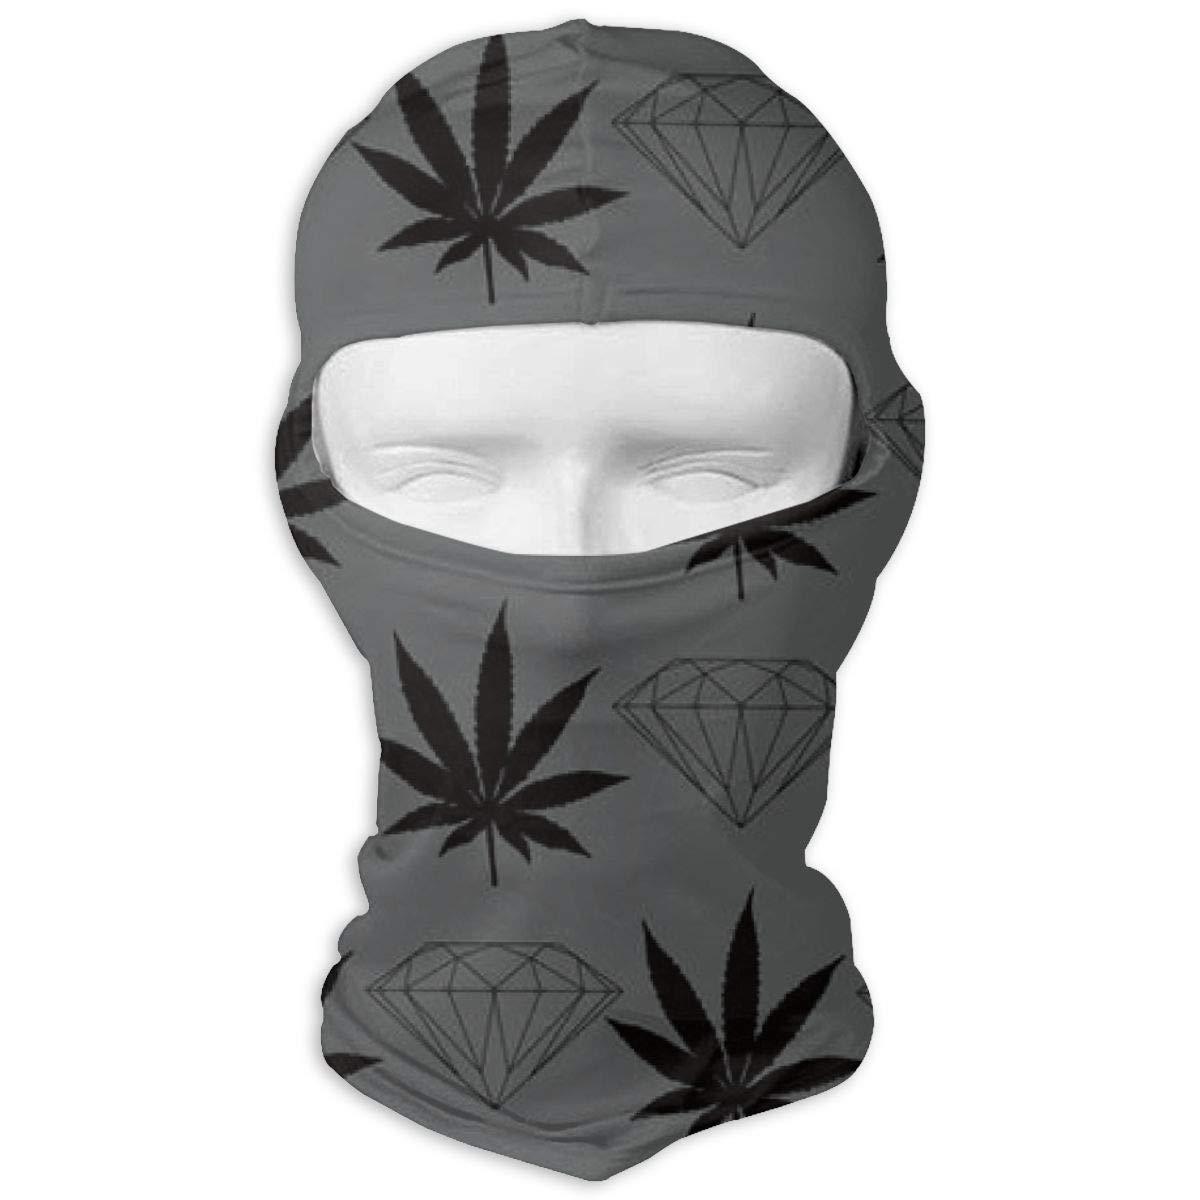 LaoJi Marijuana Weed Diamond Winter Ski Mask Balaclava Hood Wind-Resistant Face Mask